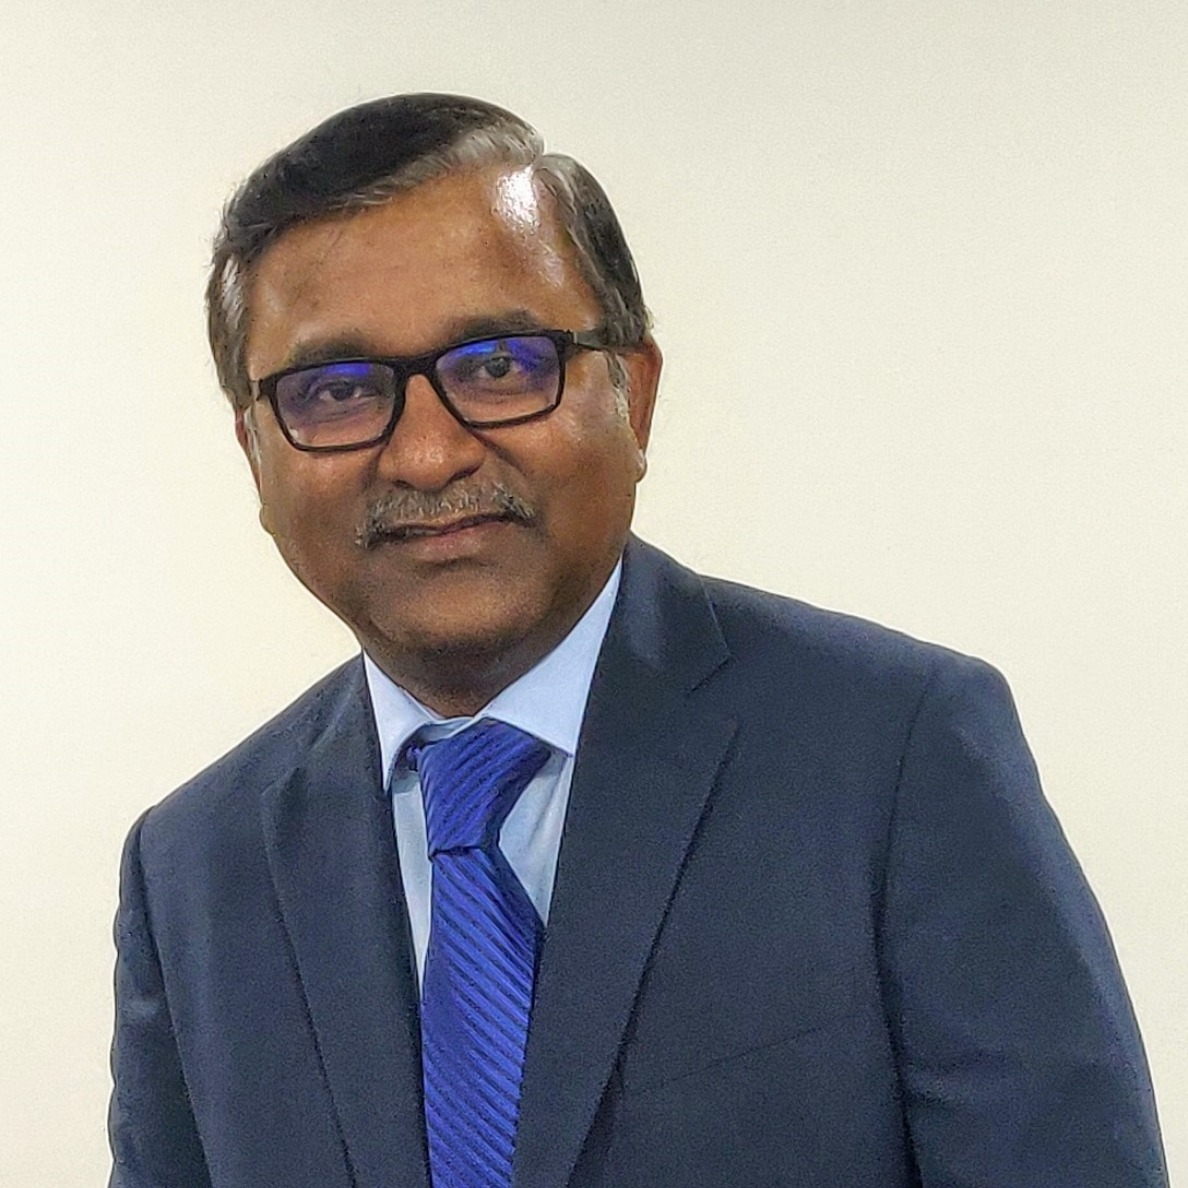 Viswanath Ramaswamy